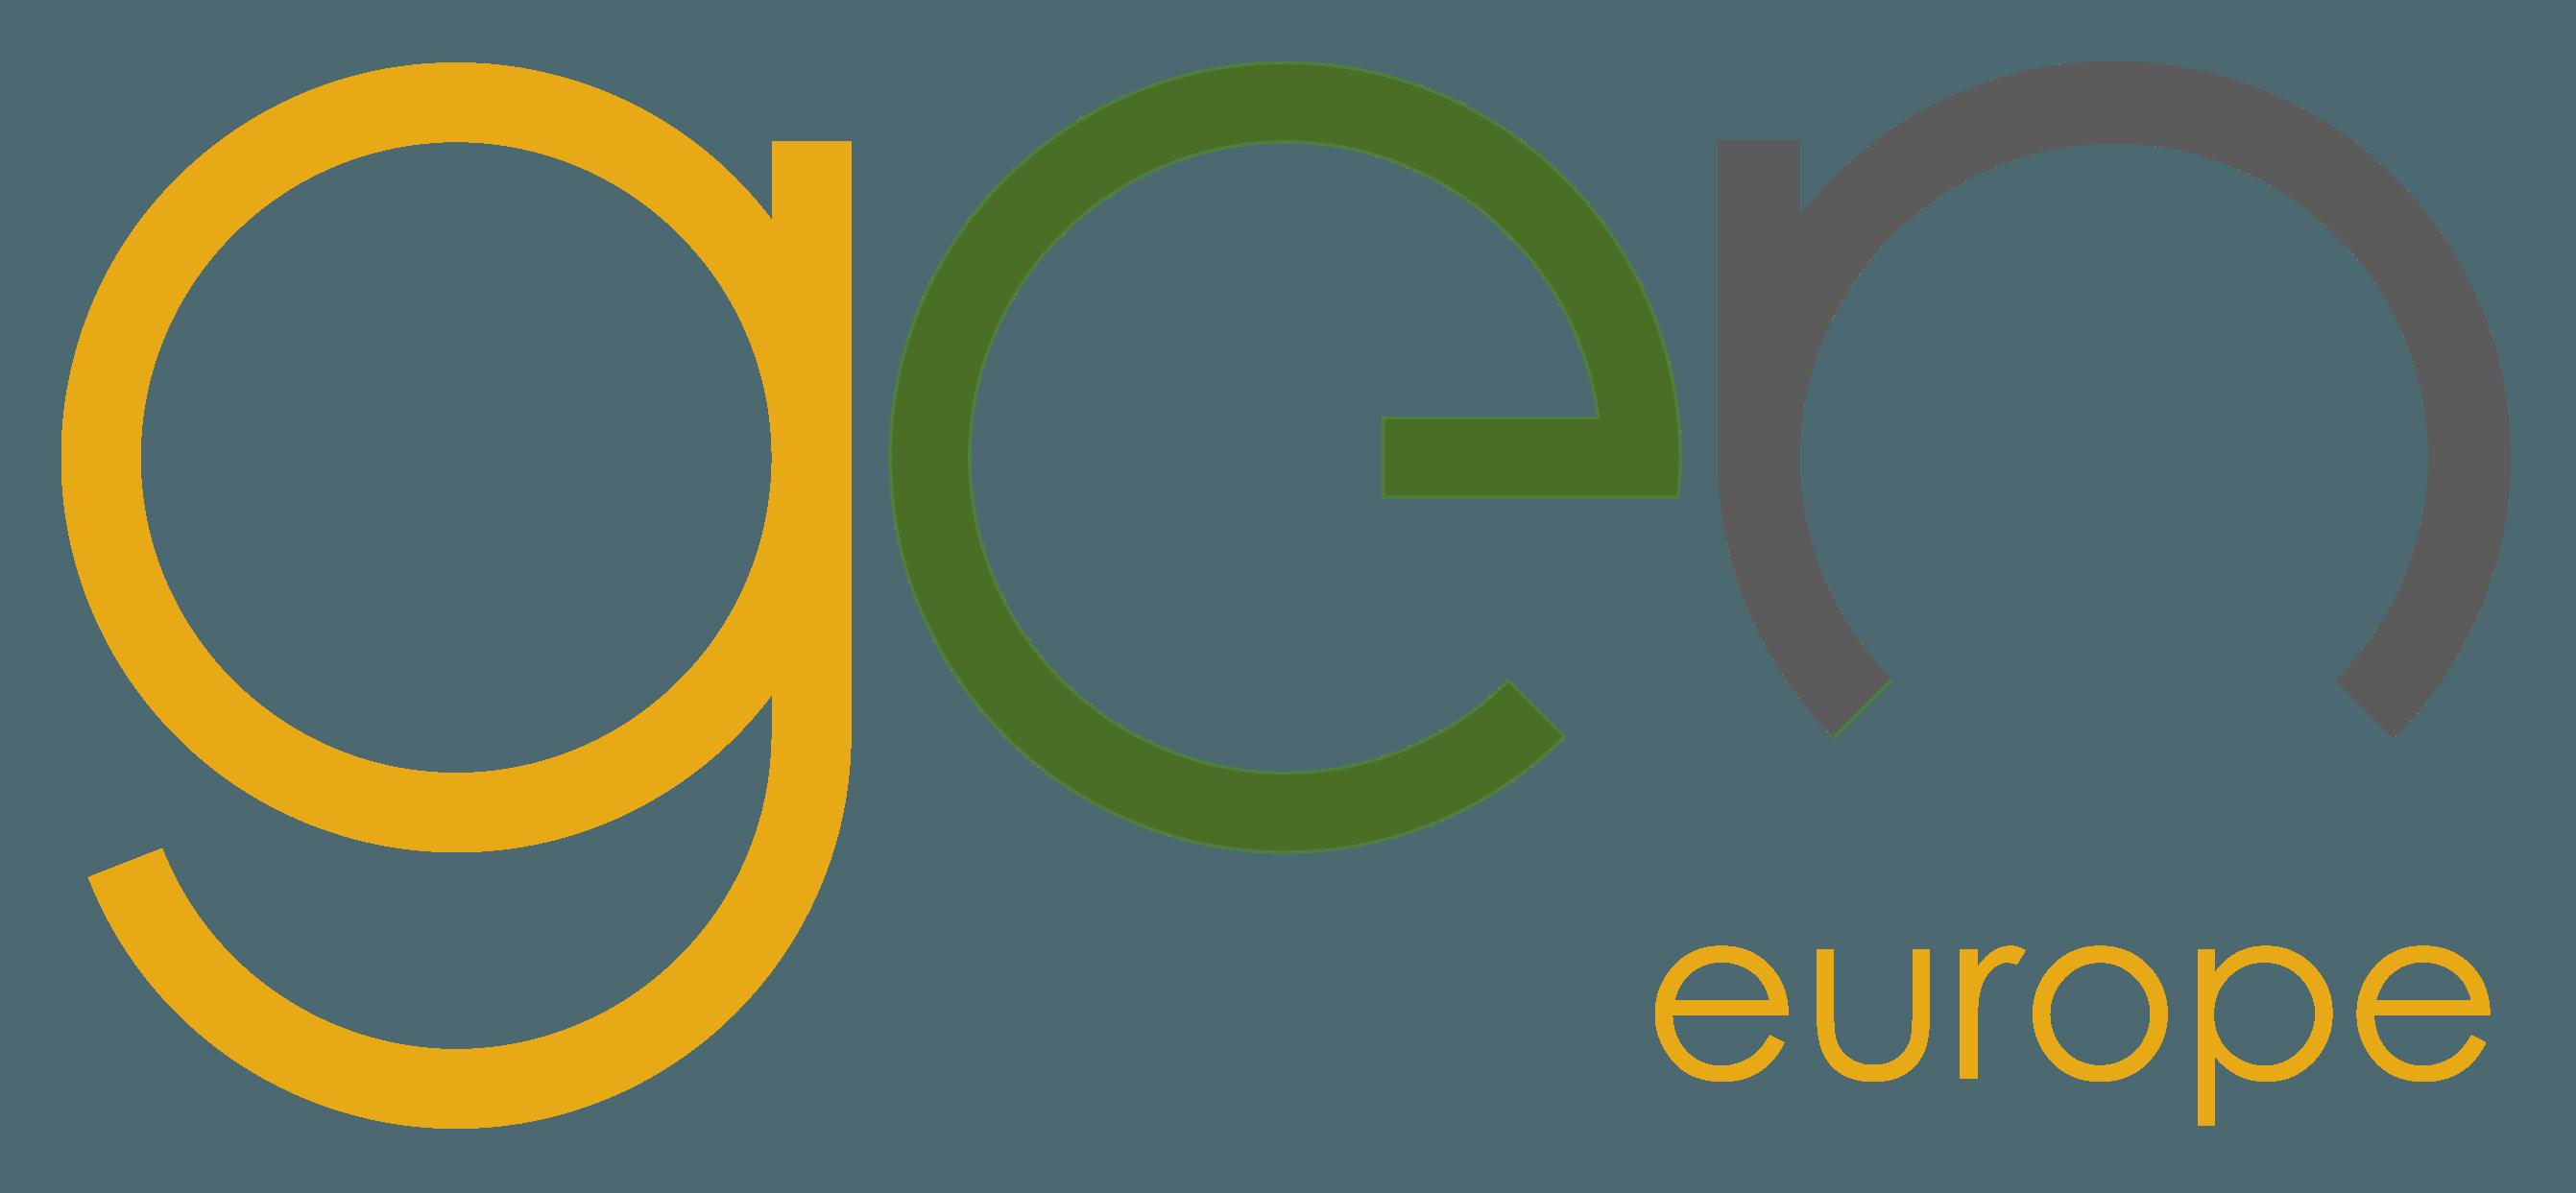 GEN Europe